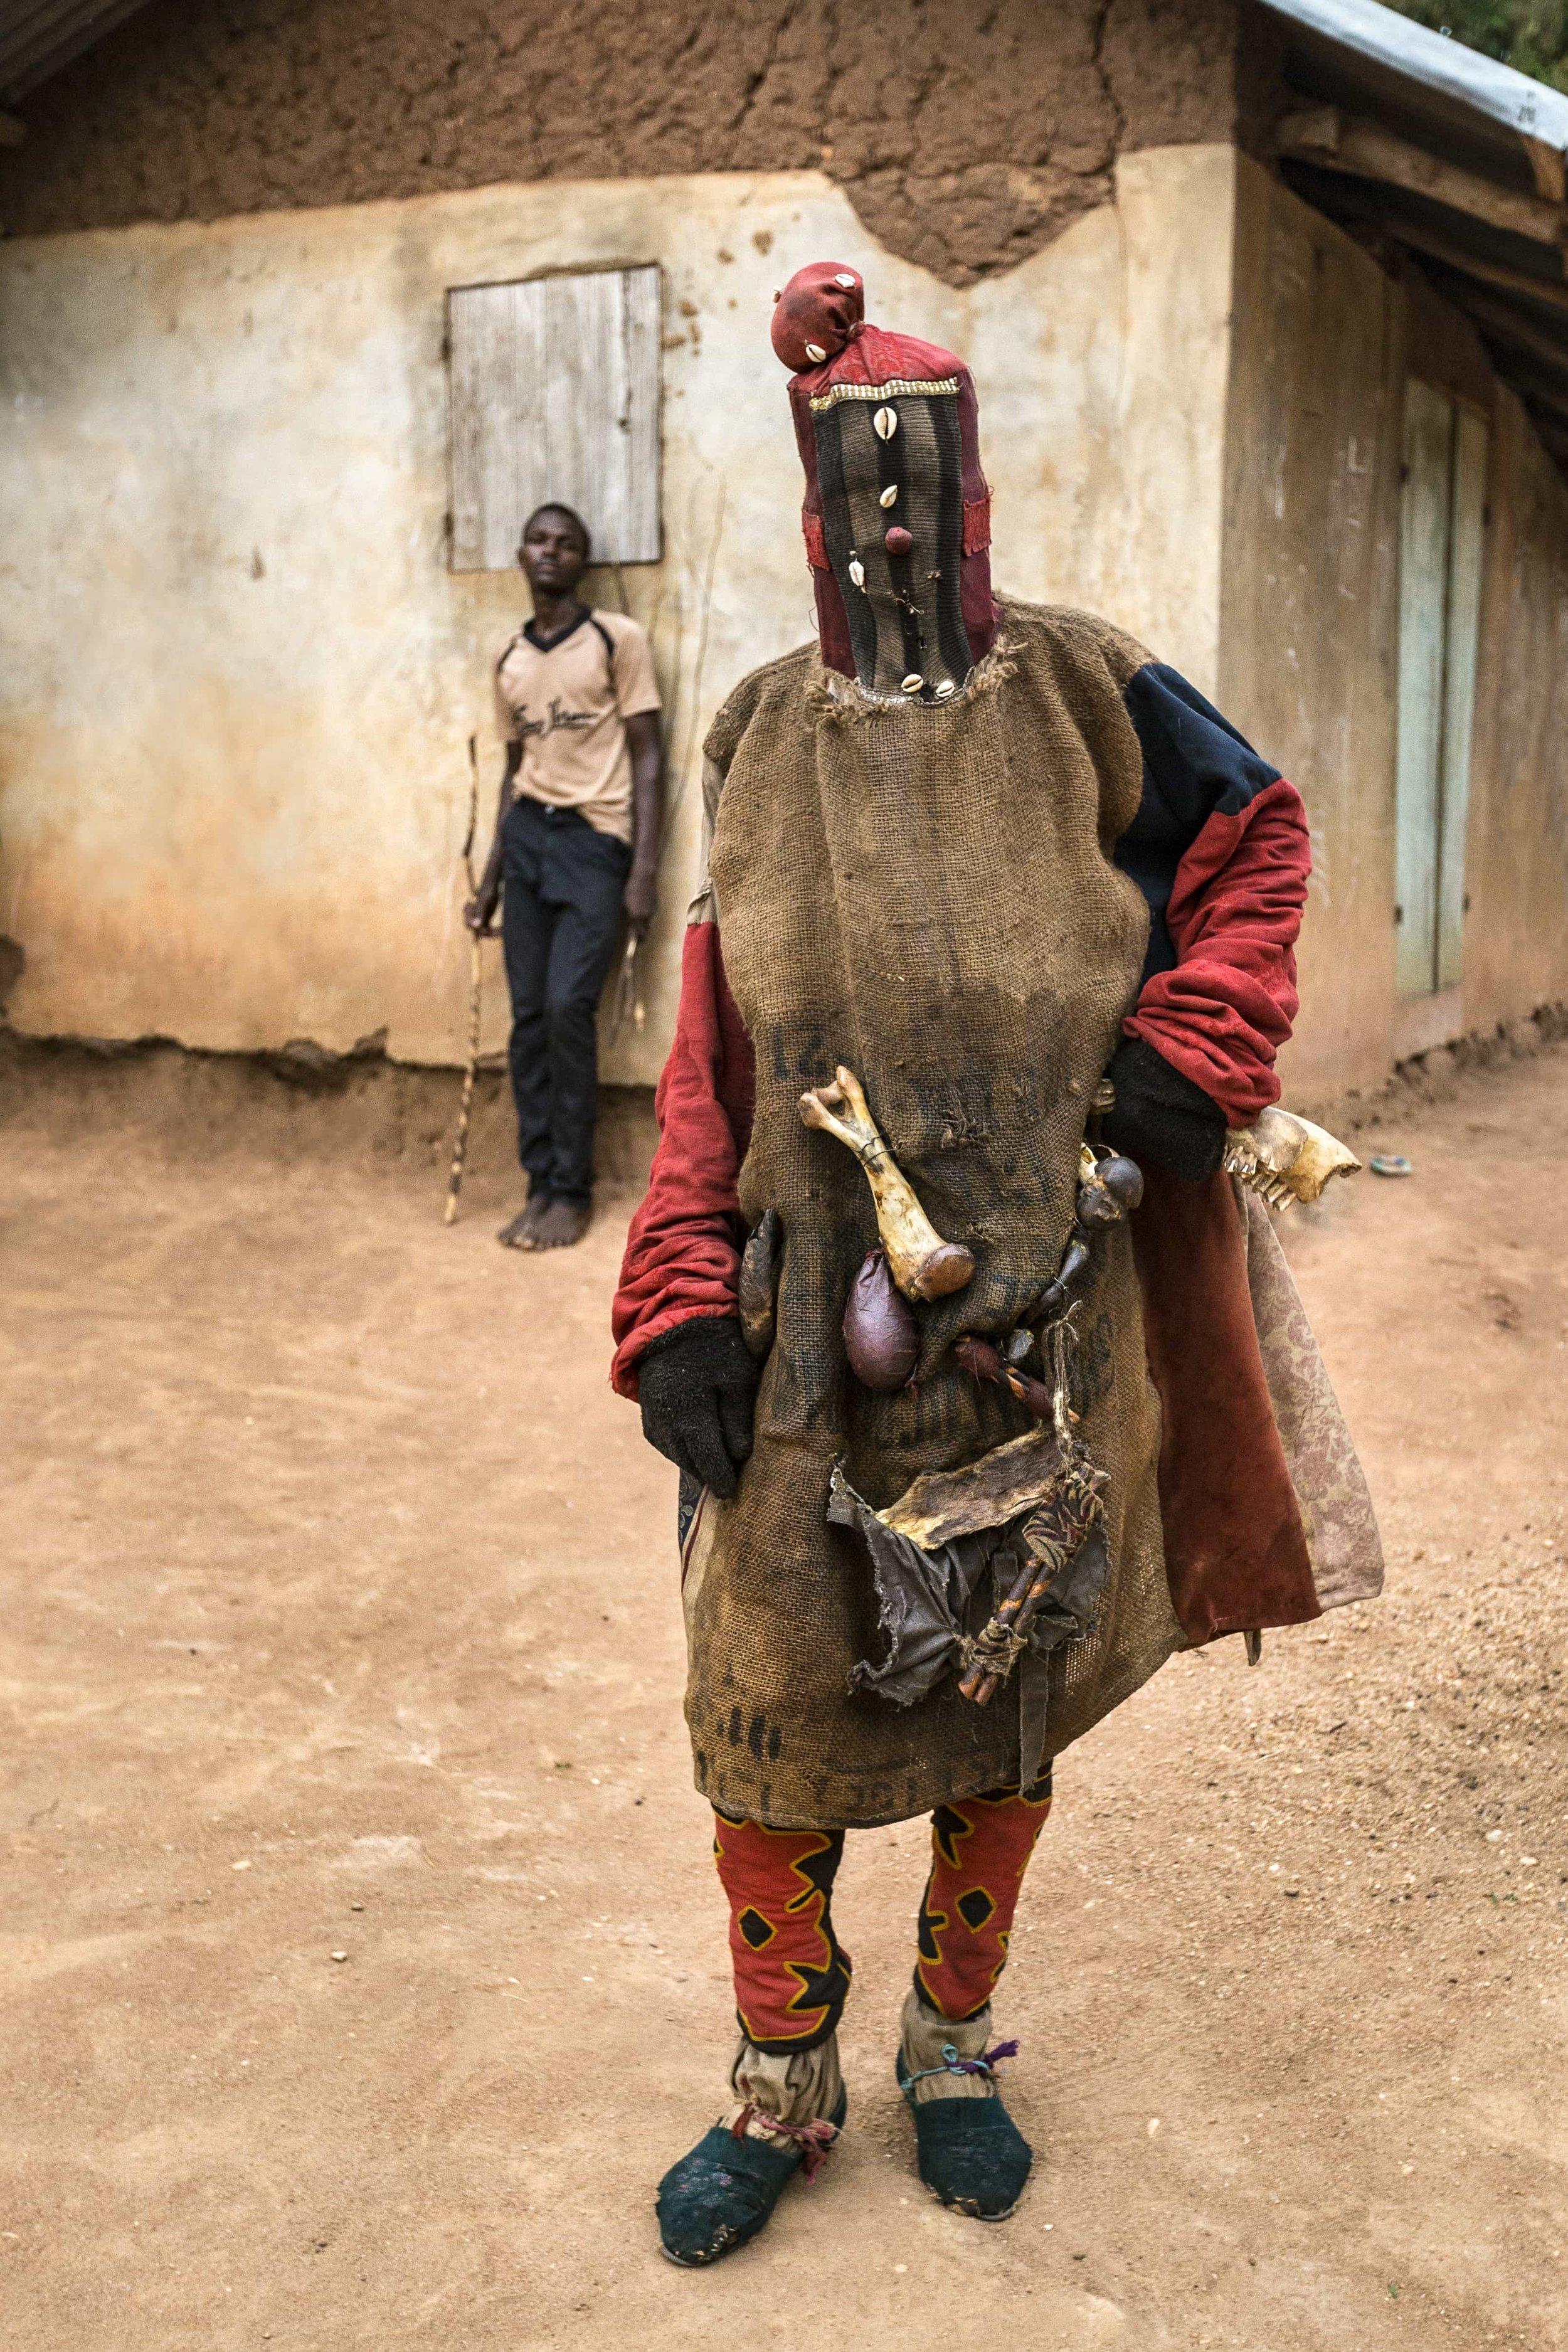 Portrait of a masqueraded Egoun Goun spirit at a Voodoo ritual ceremony.